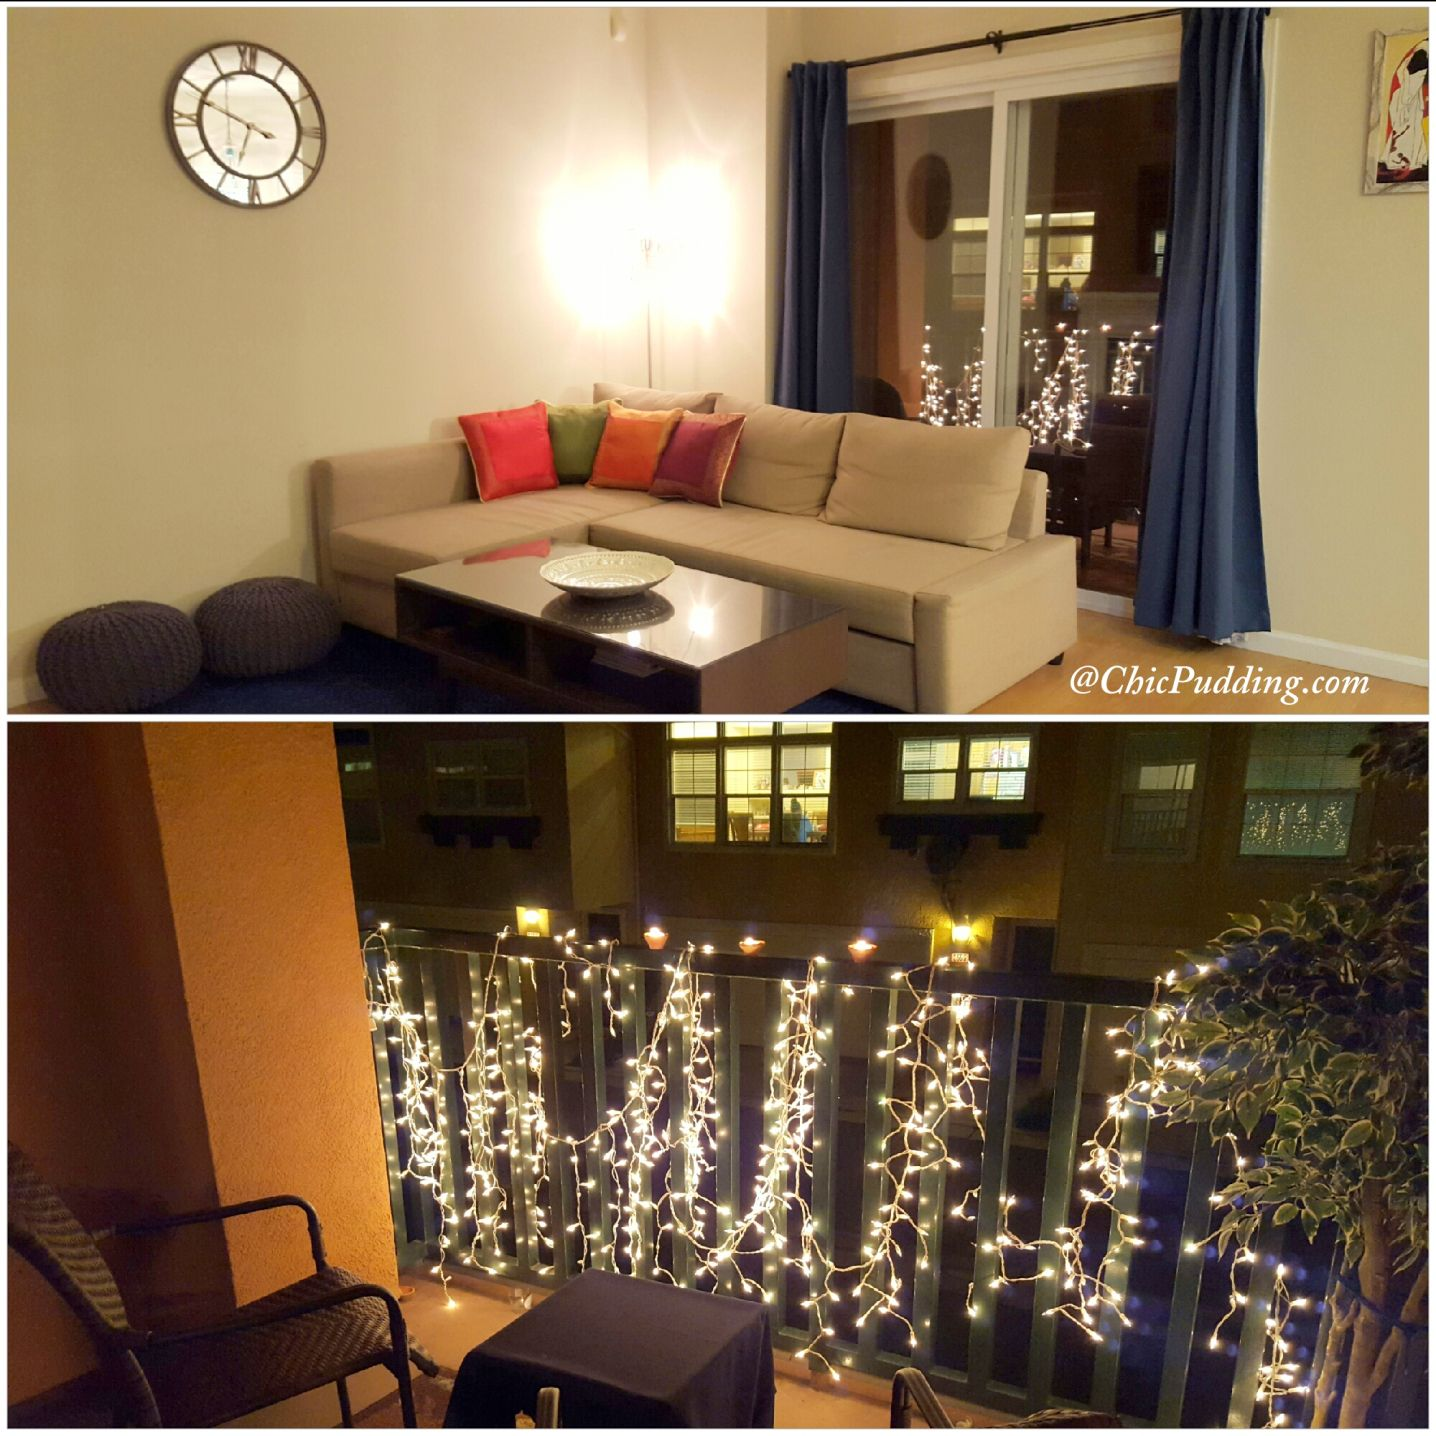 My Diwali Decor An Eclectic Blend Home Decor Decor Diwali Decorations